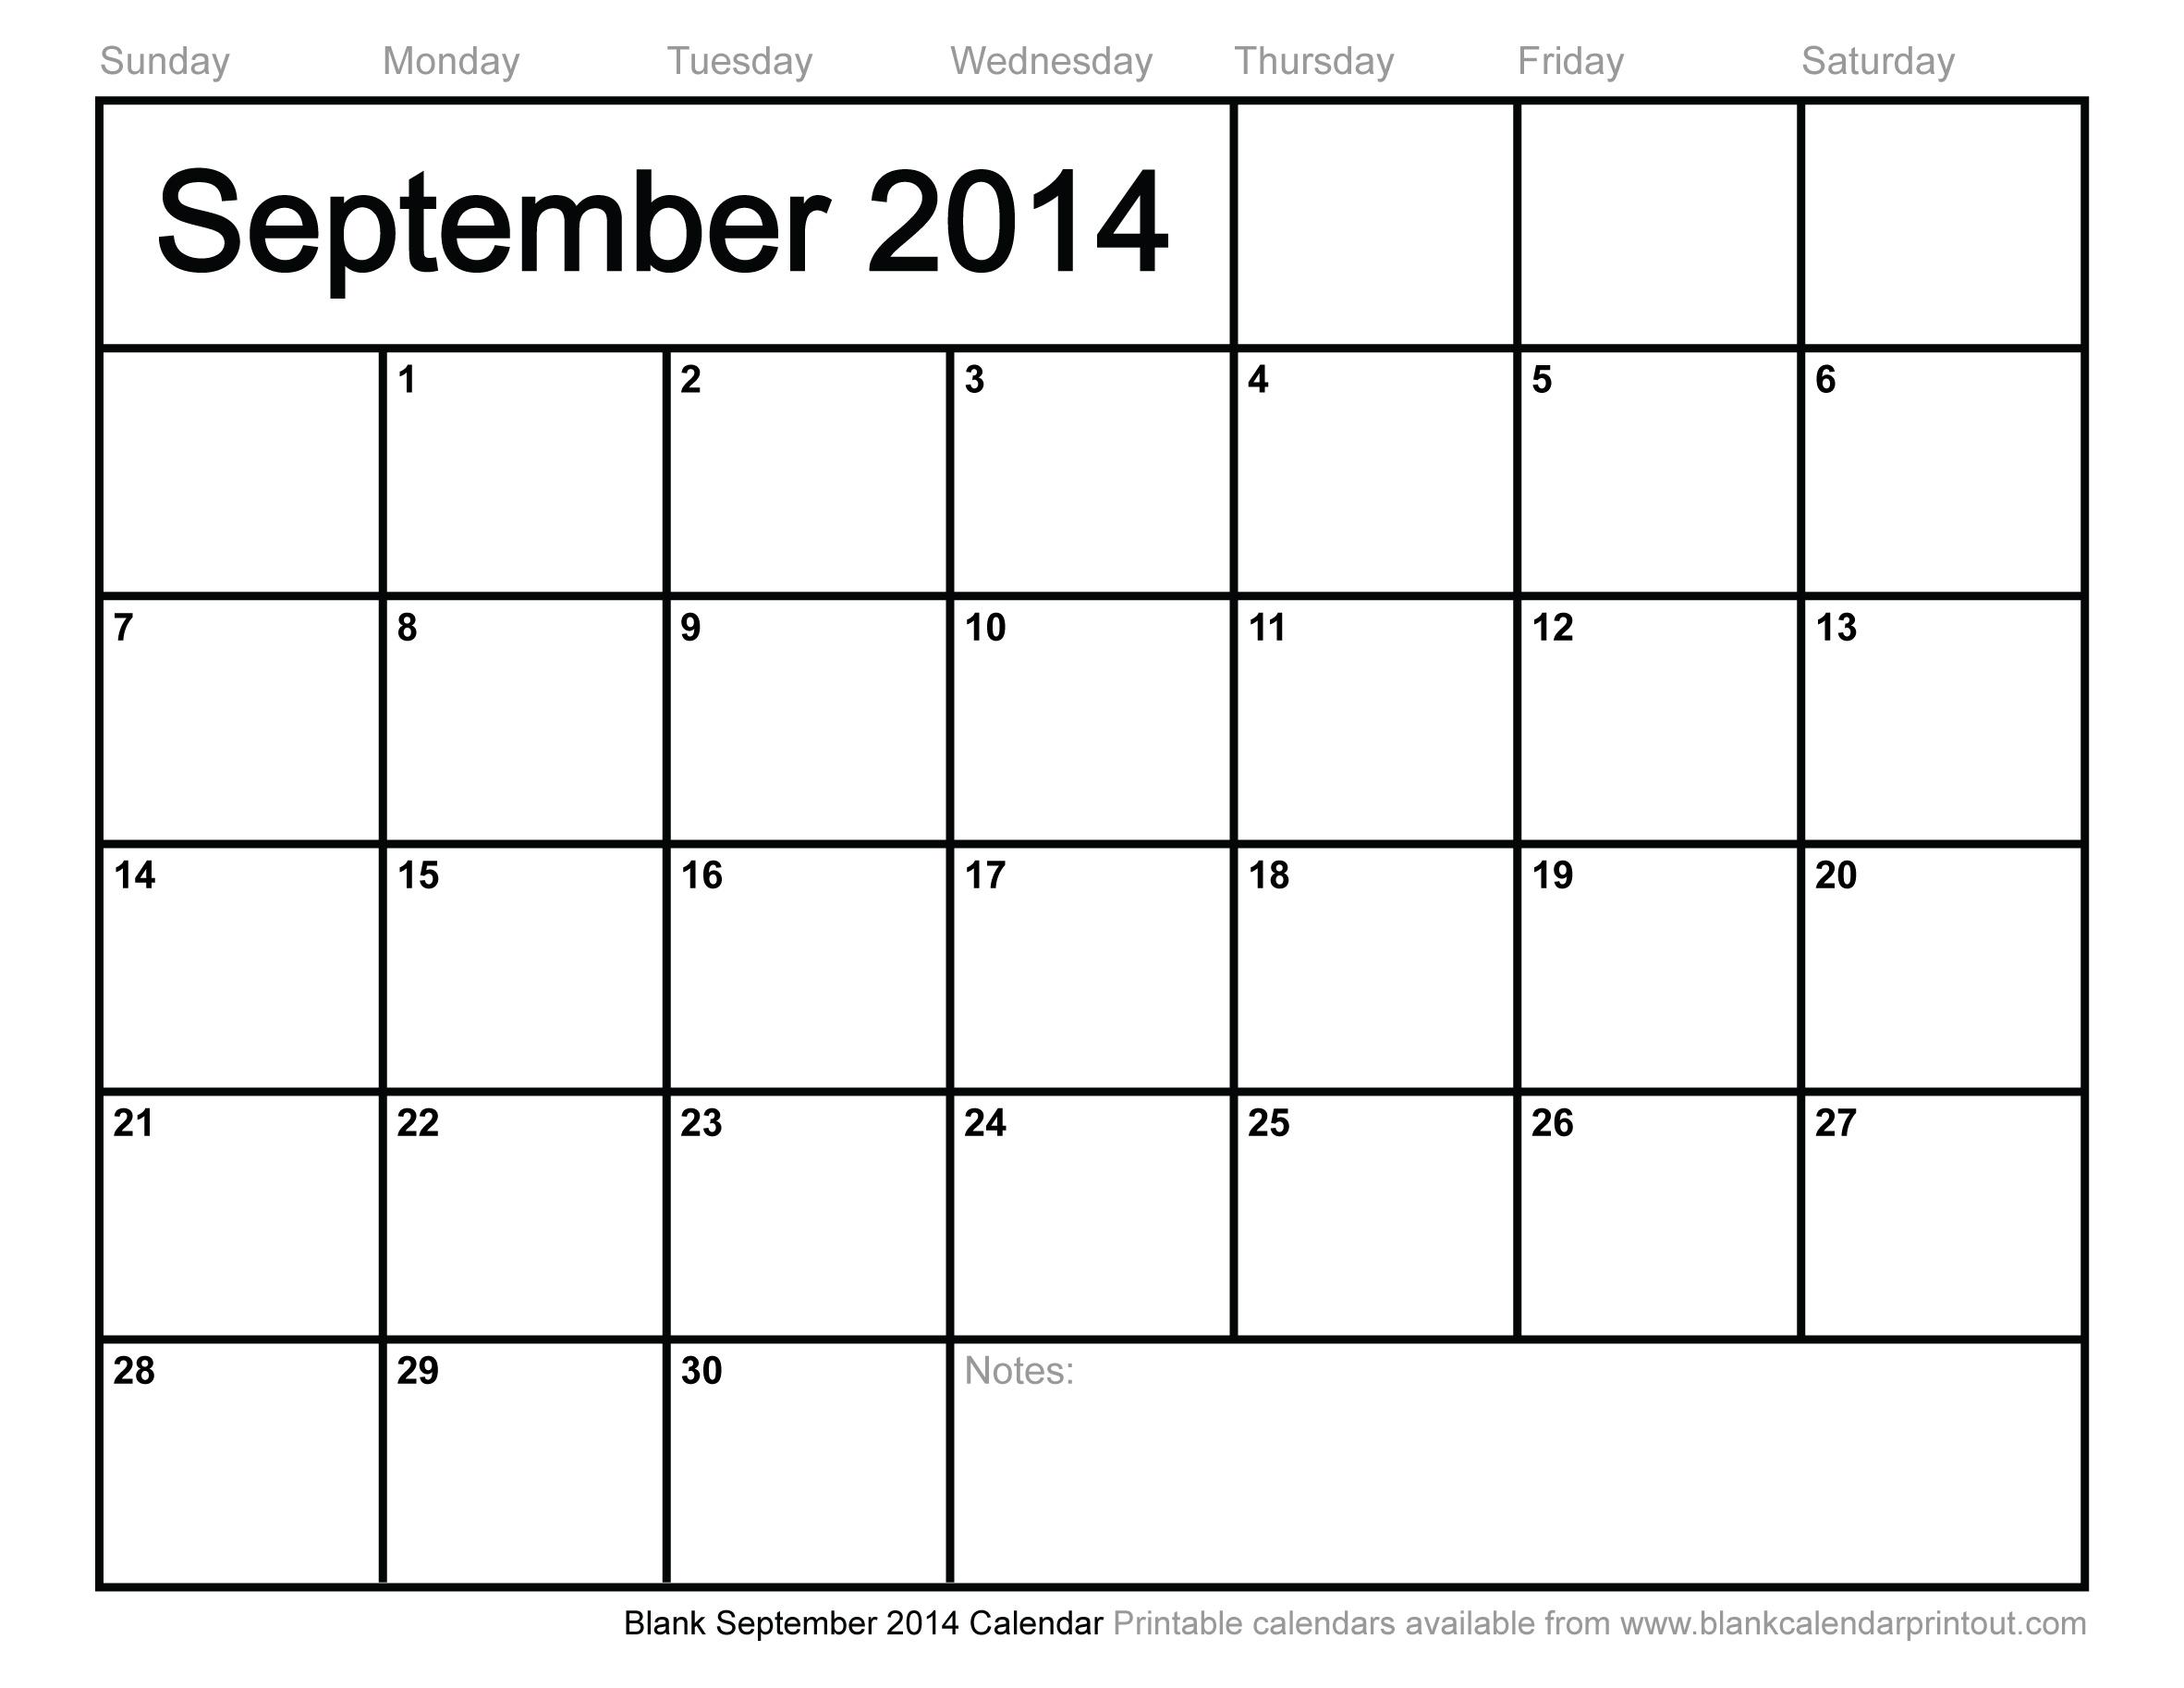 Blank September 2014 Calendar To Print